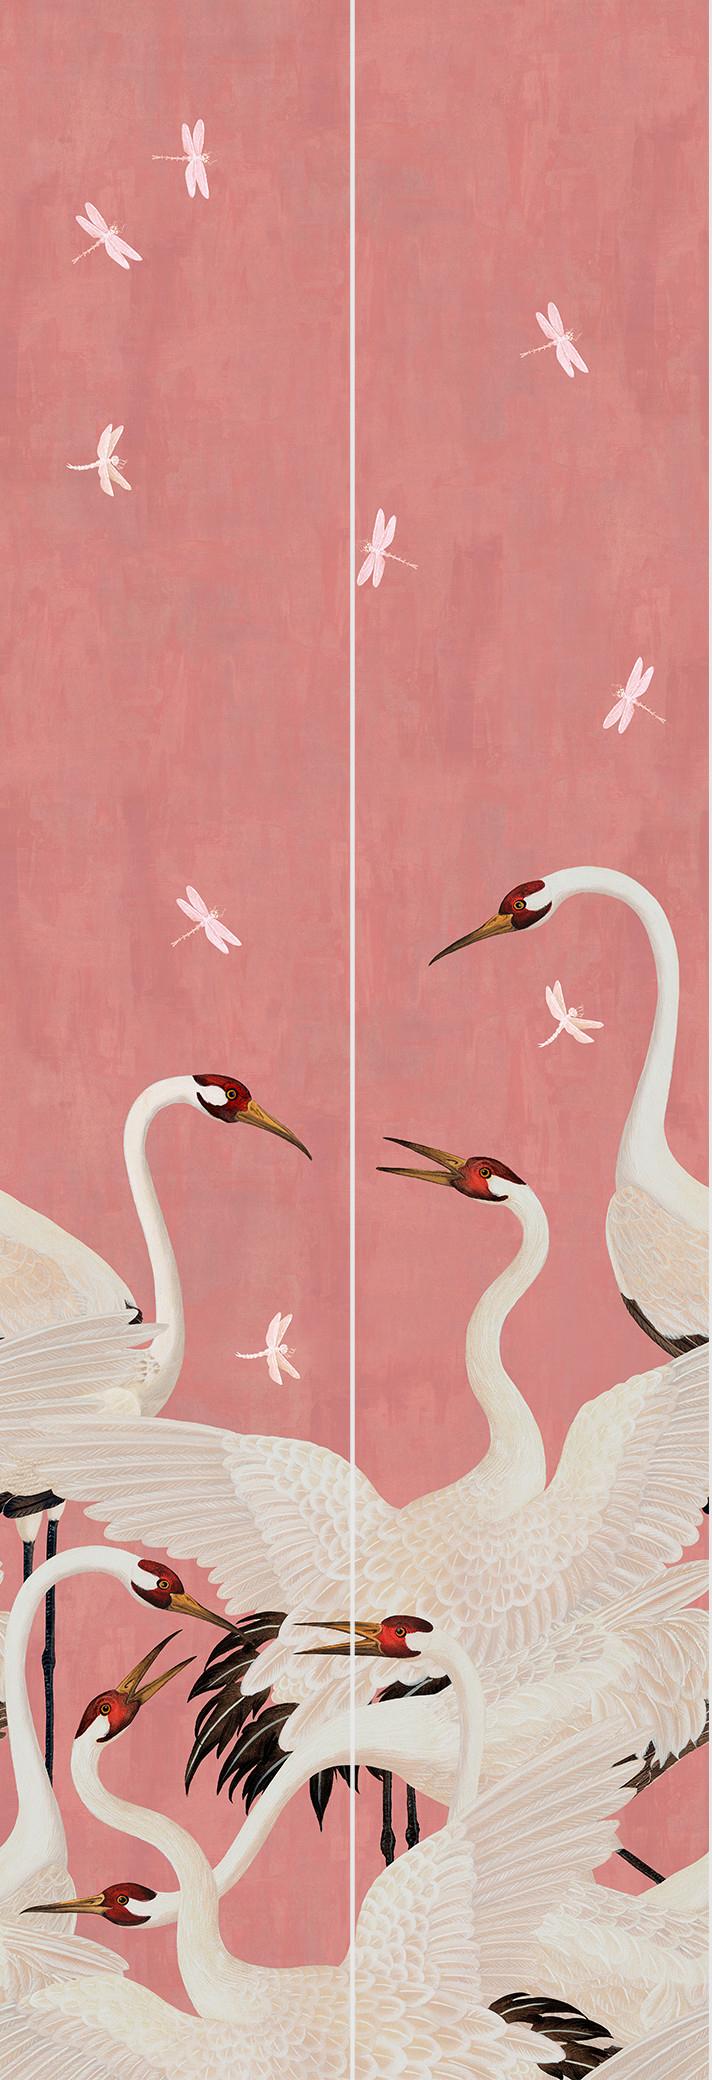 Heron-print-wallpaper 3.jpg